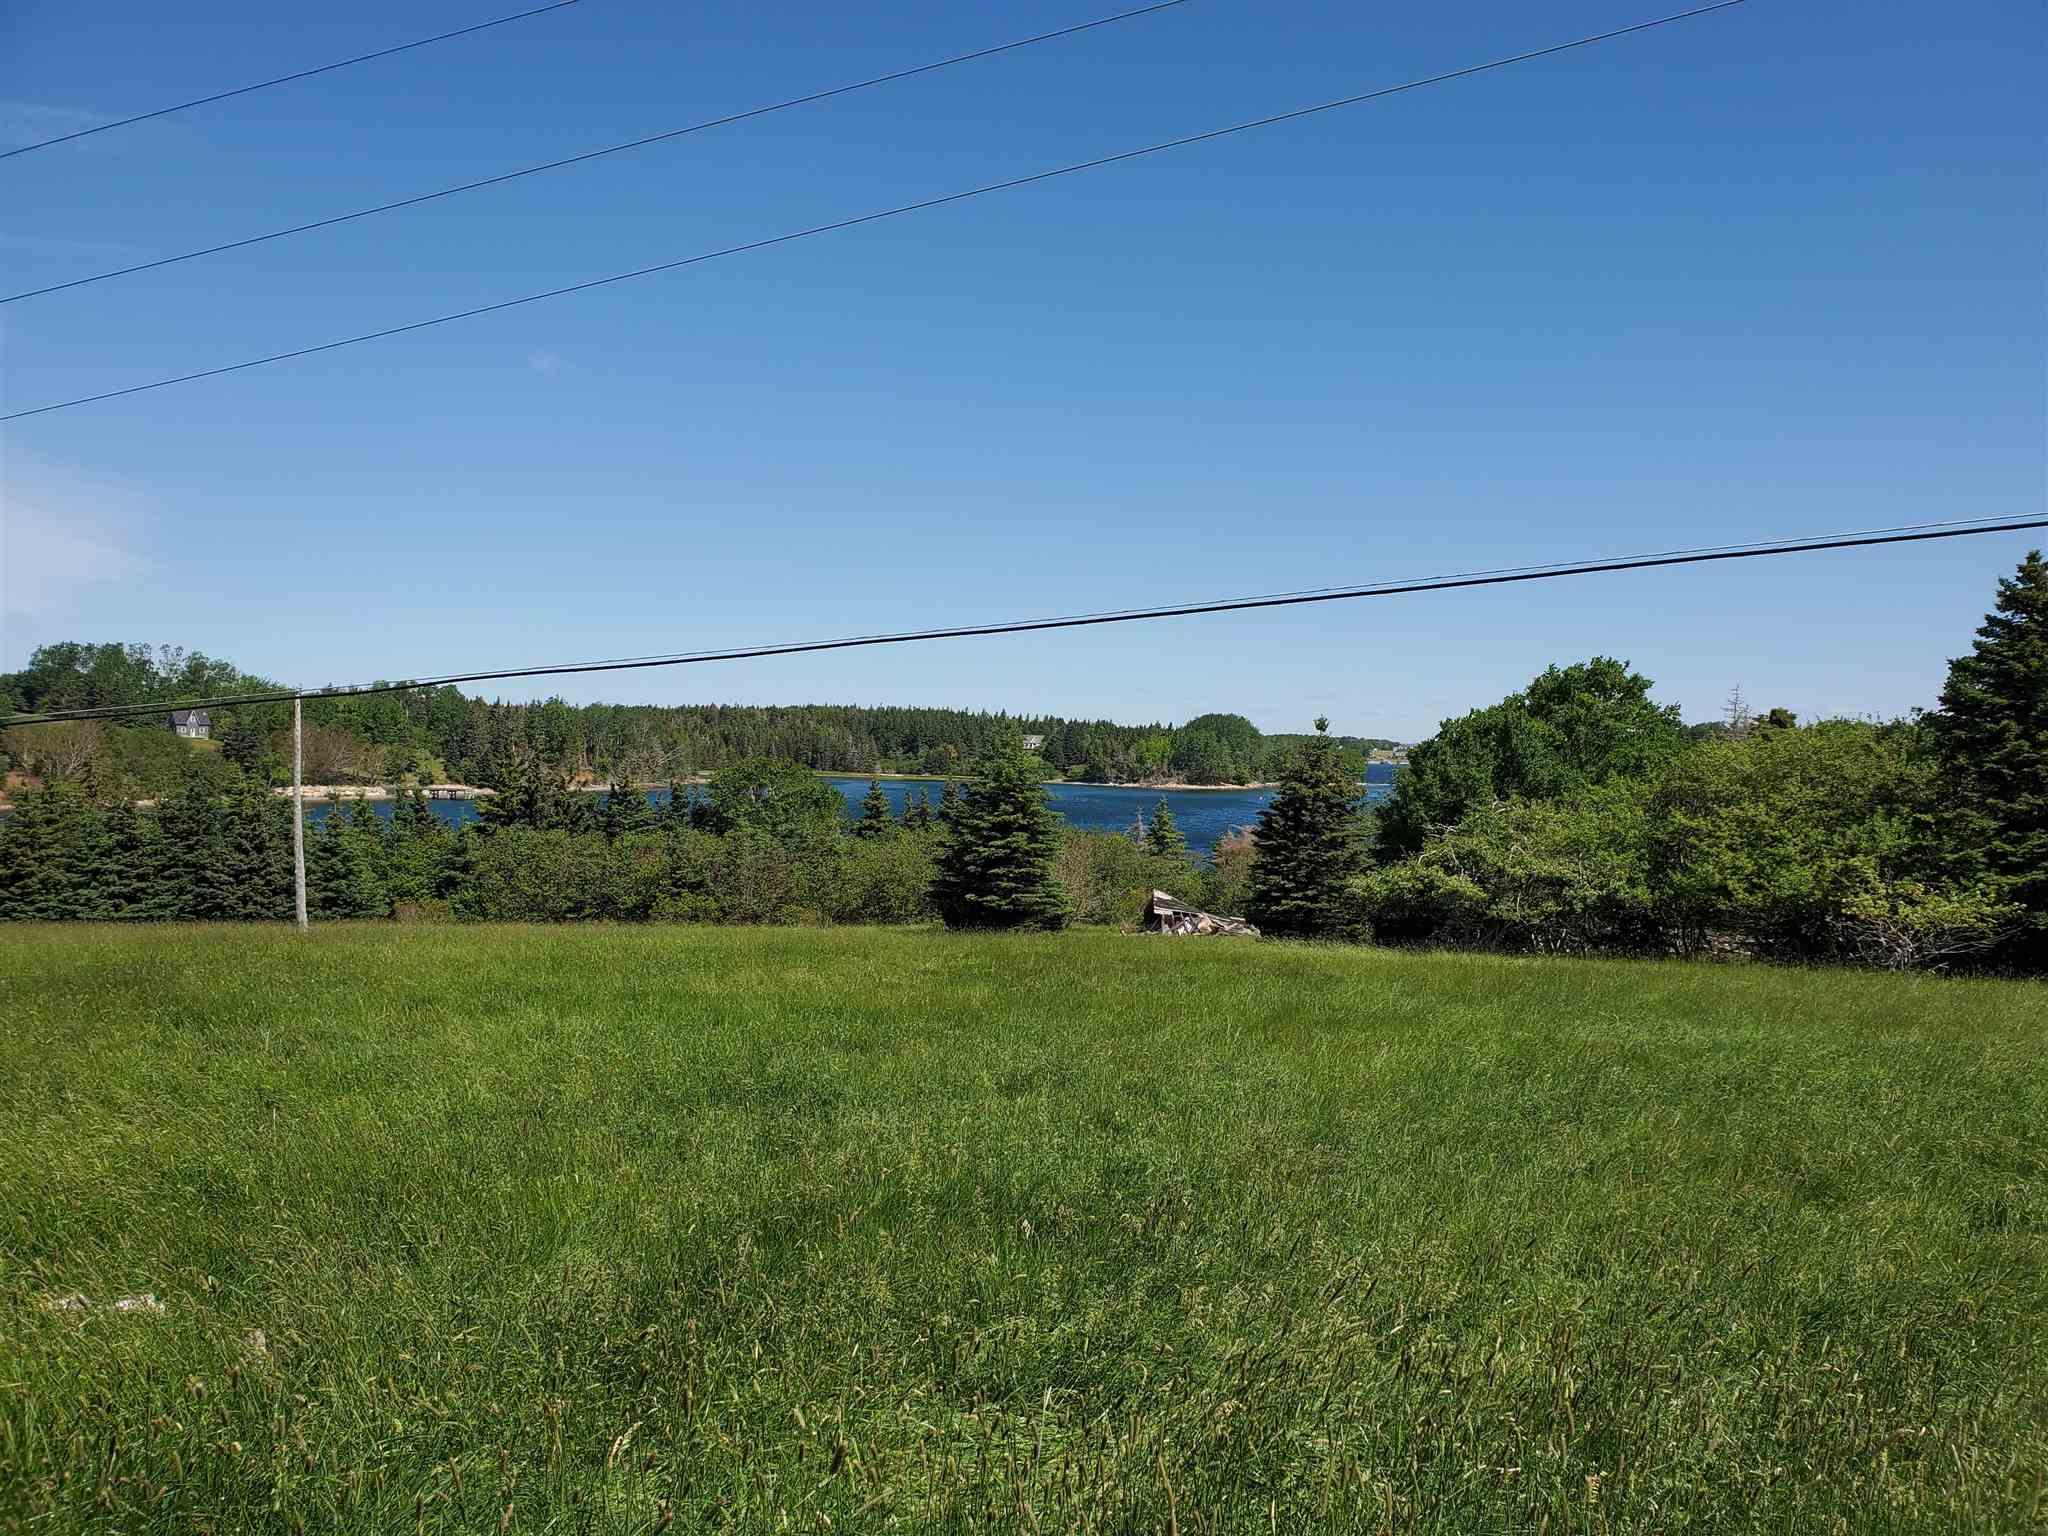 Rous Island, Indian Point, Nova Scotia (ID 202107279)